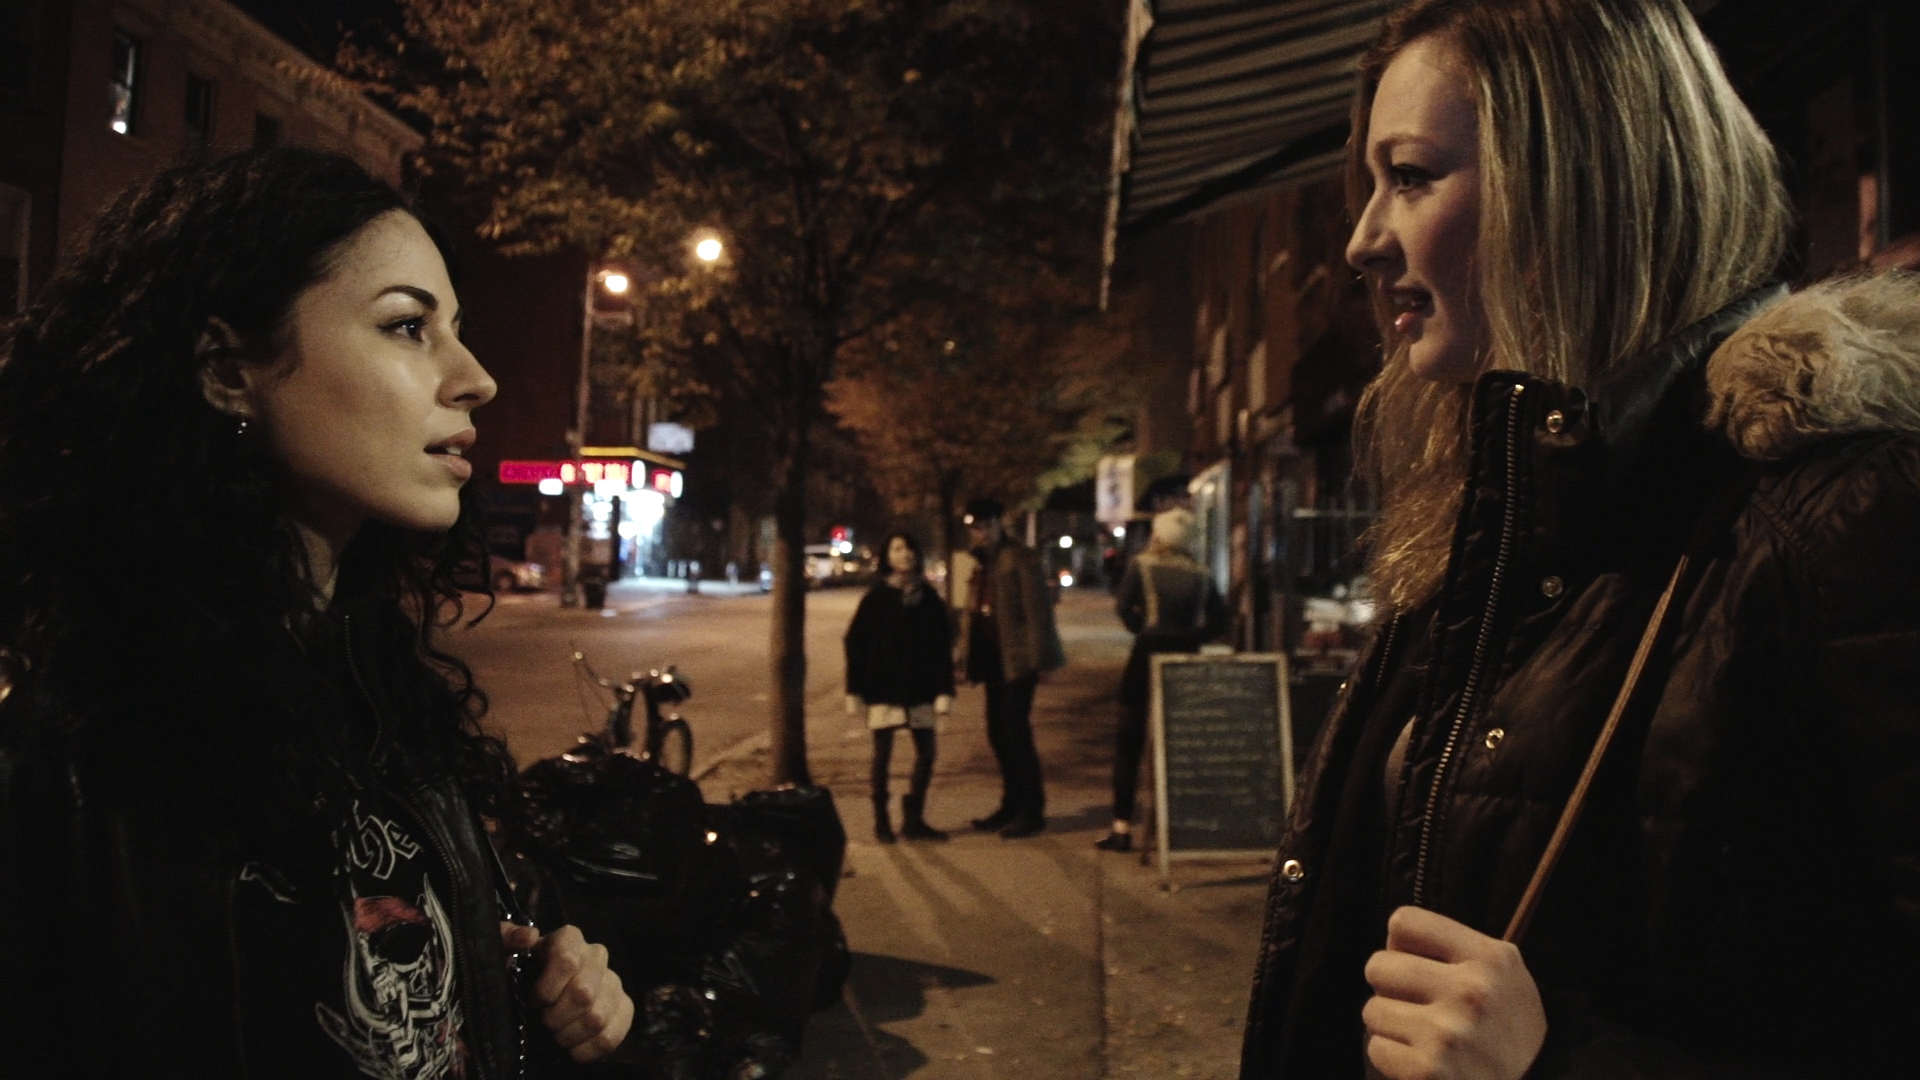 Pingo (Nicola Ferguson) right, has a chance encounter with an old friend, Dana (Jodi Ferguson) on the streets of NYC.